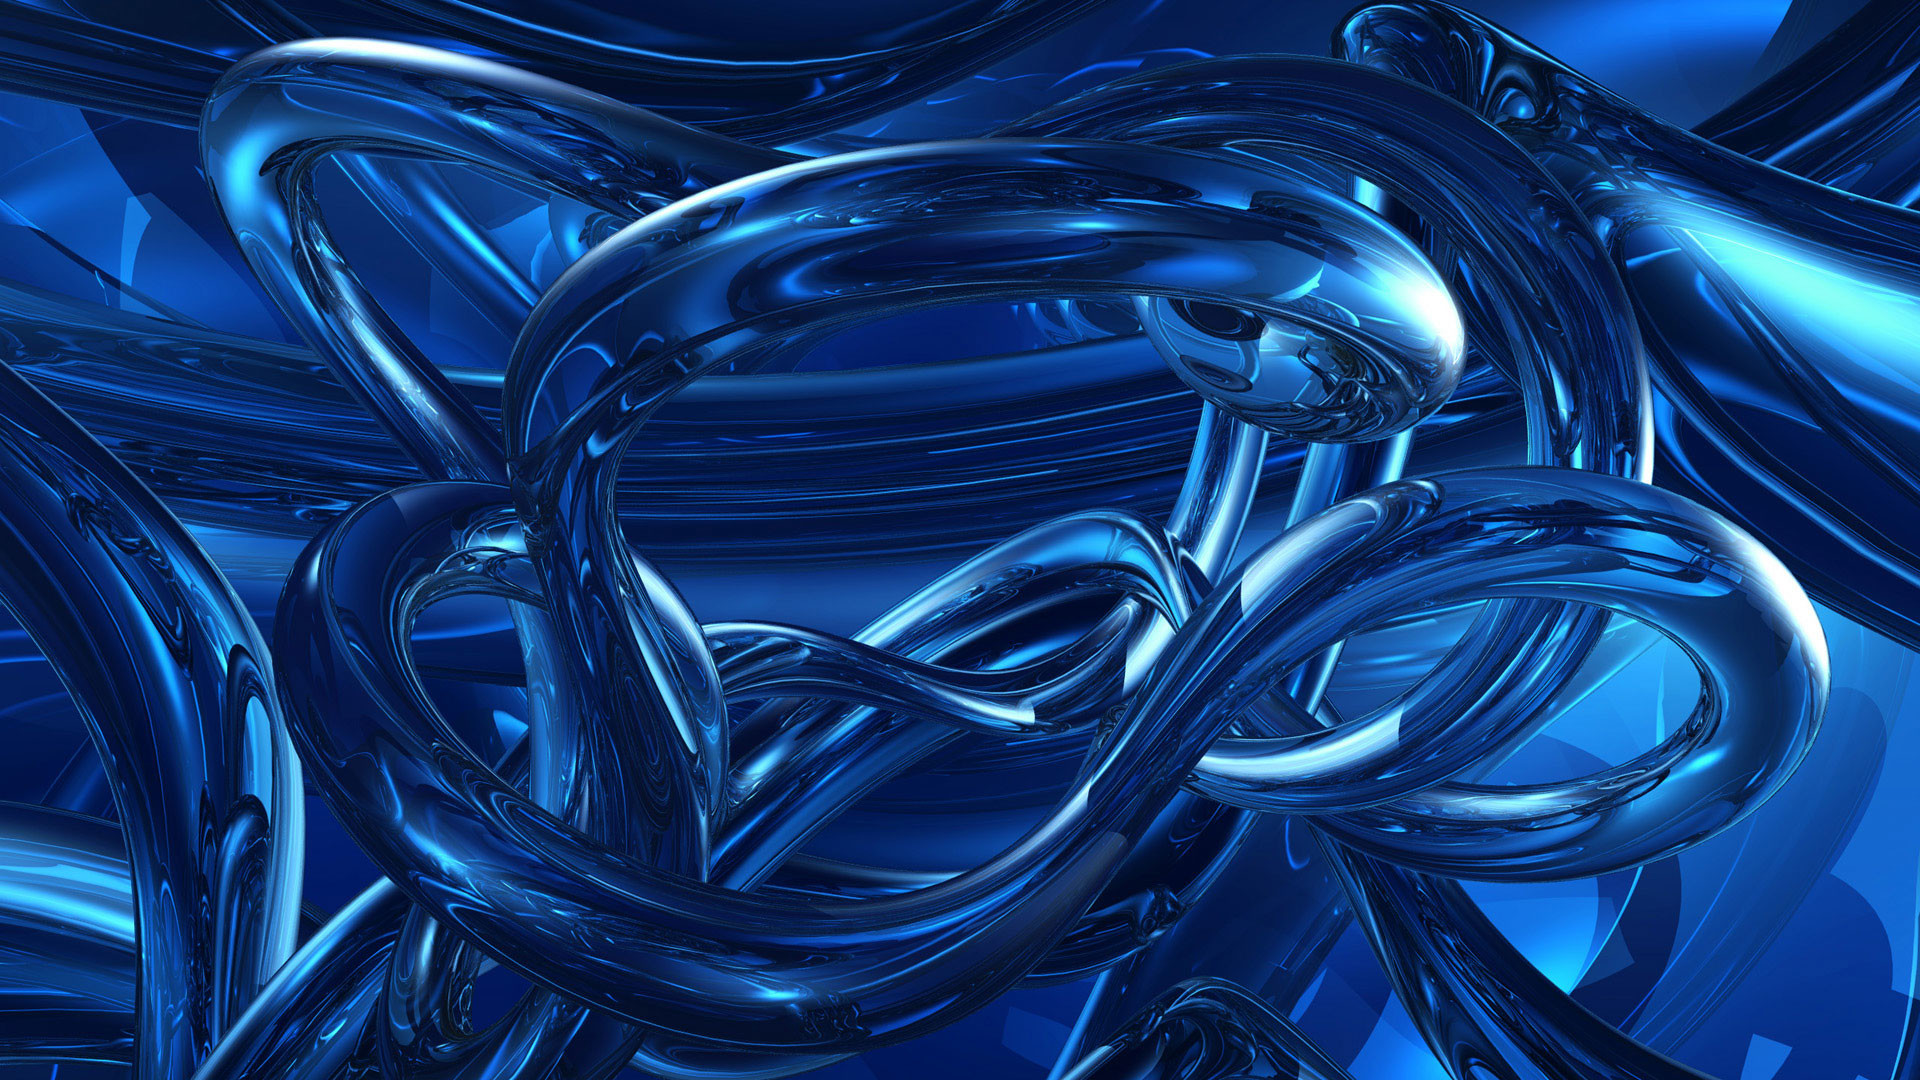 https://www.hdwallpapers.in/walls/dark_blue_abstracts-HD.jpg   Digital  Abstract Art   Pinterest   Dark blue, Wallpaper and 3d